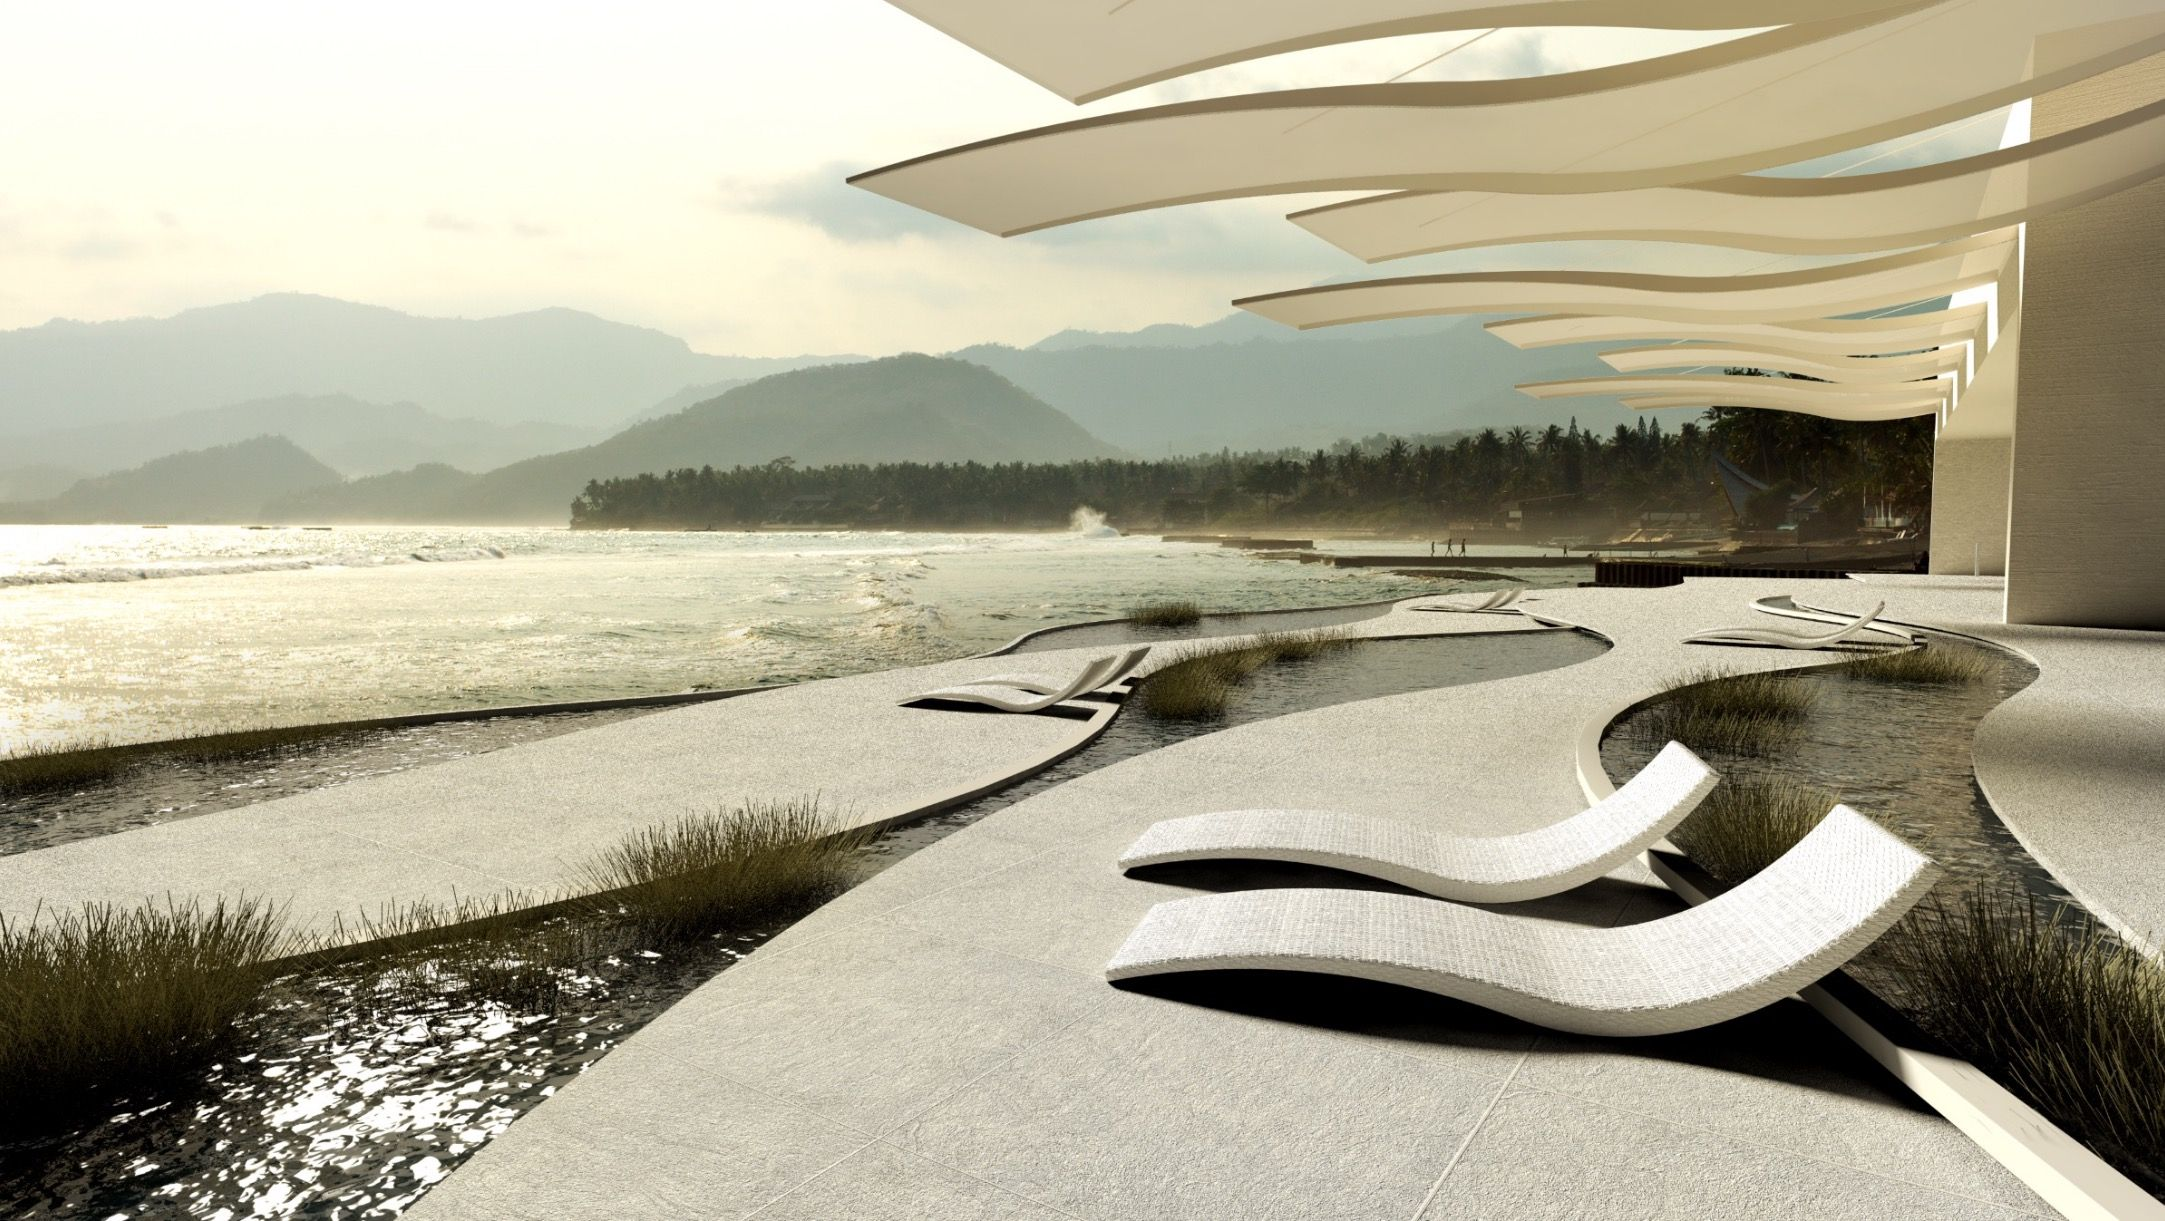 Creation Terrasse Hotel Design Amenagement Exterieur Creation 3d Architecture Benoit Redard Great Wave Architecture Artwork